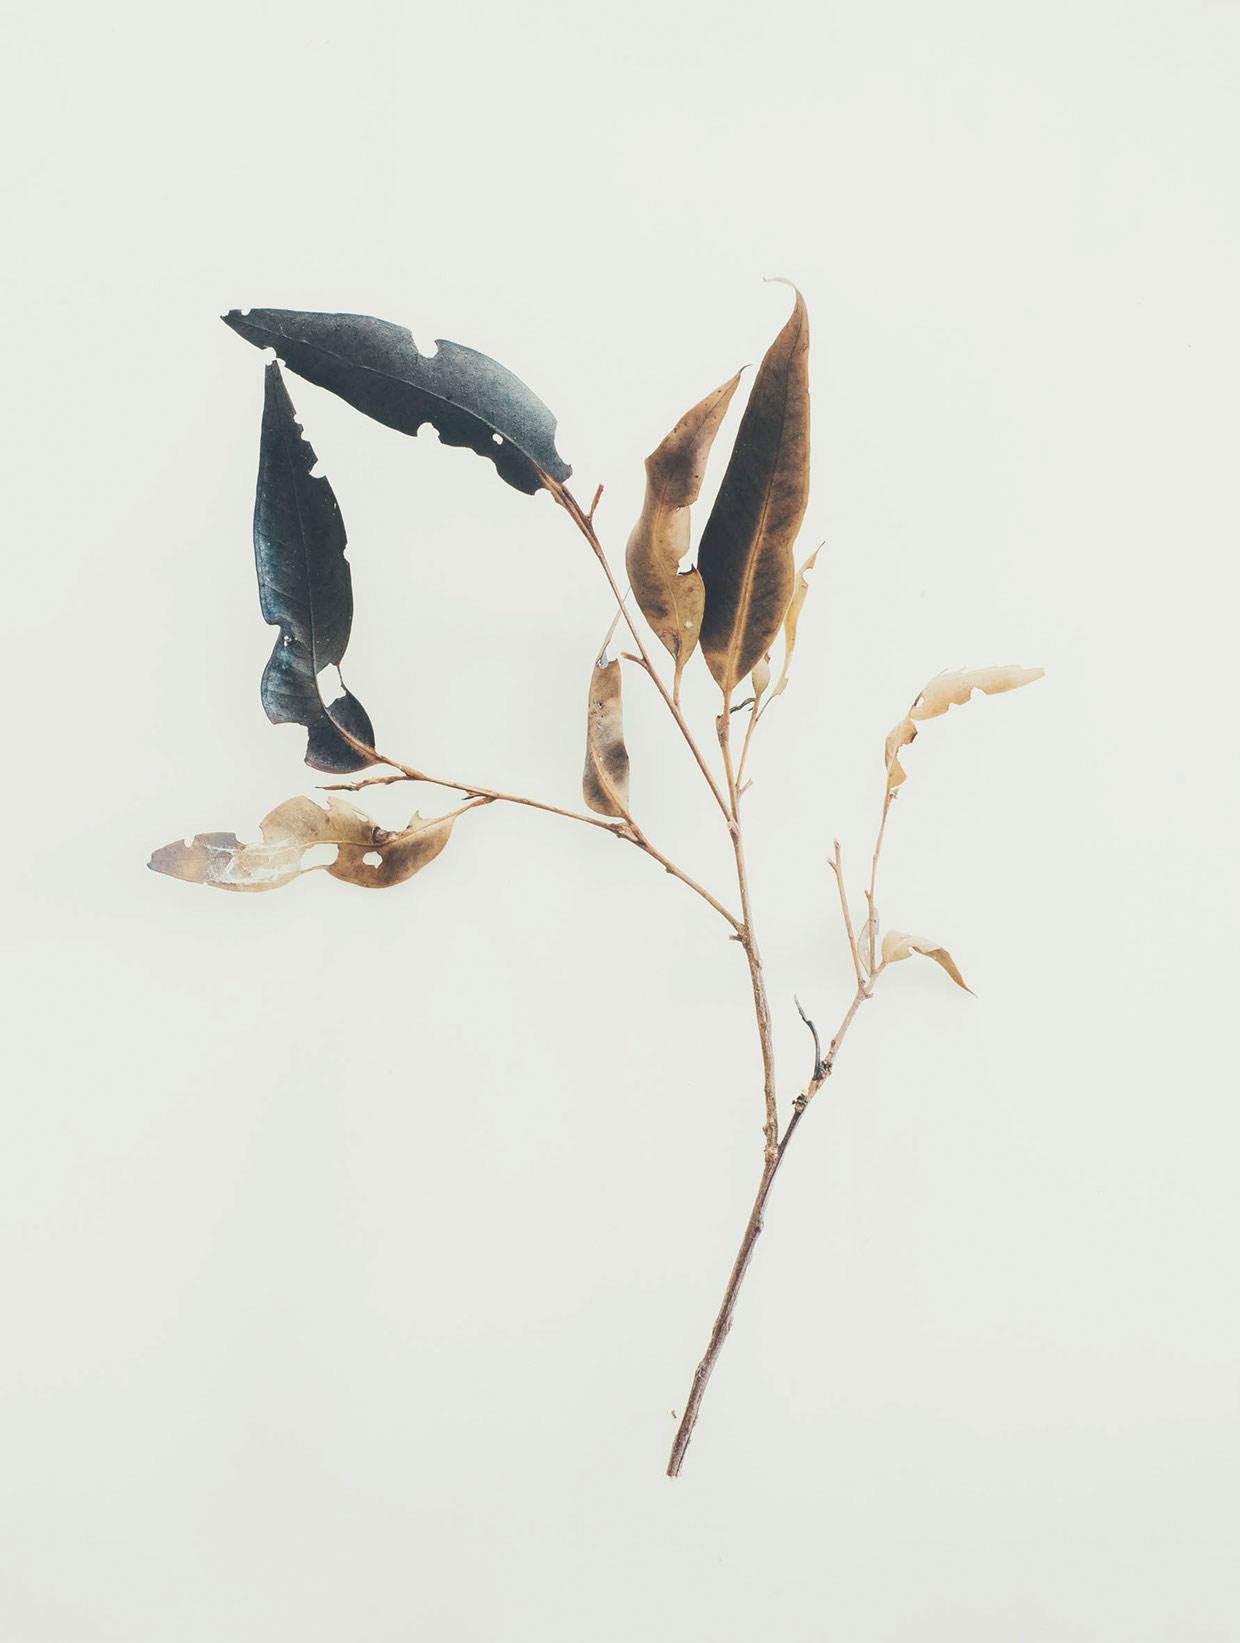 jared-fowler14